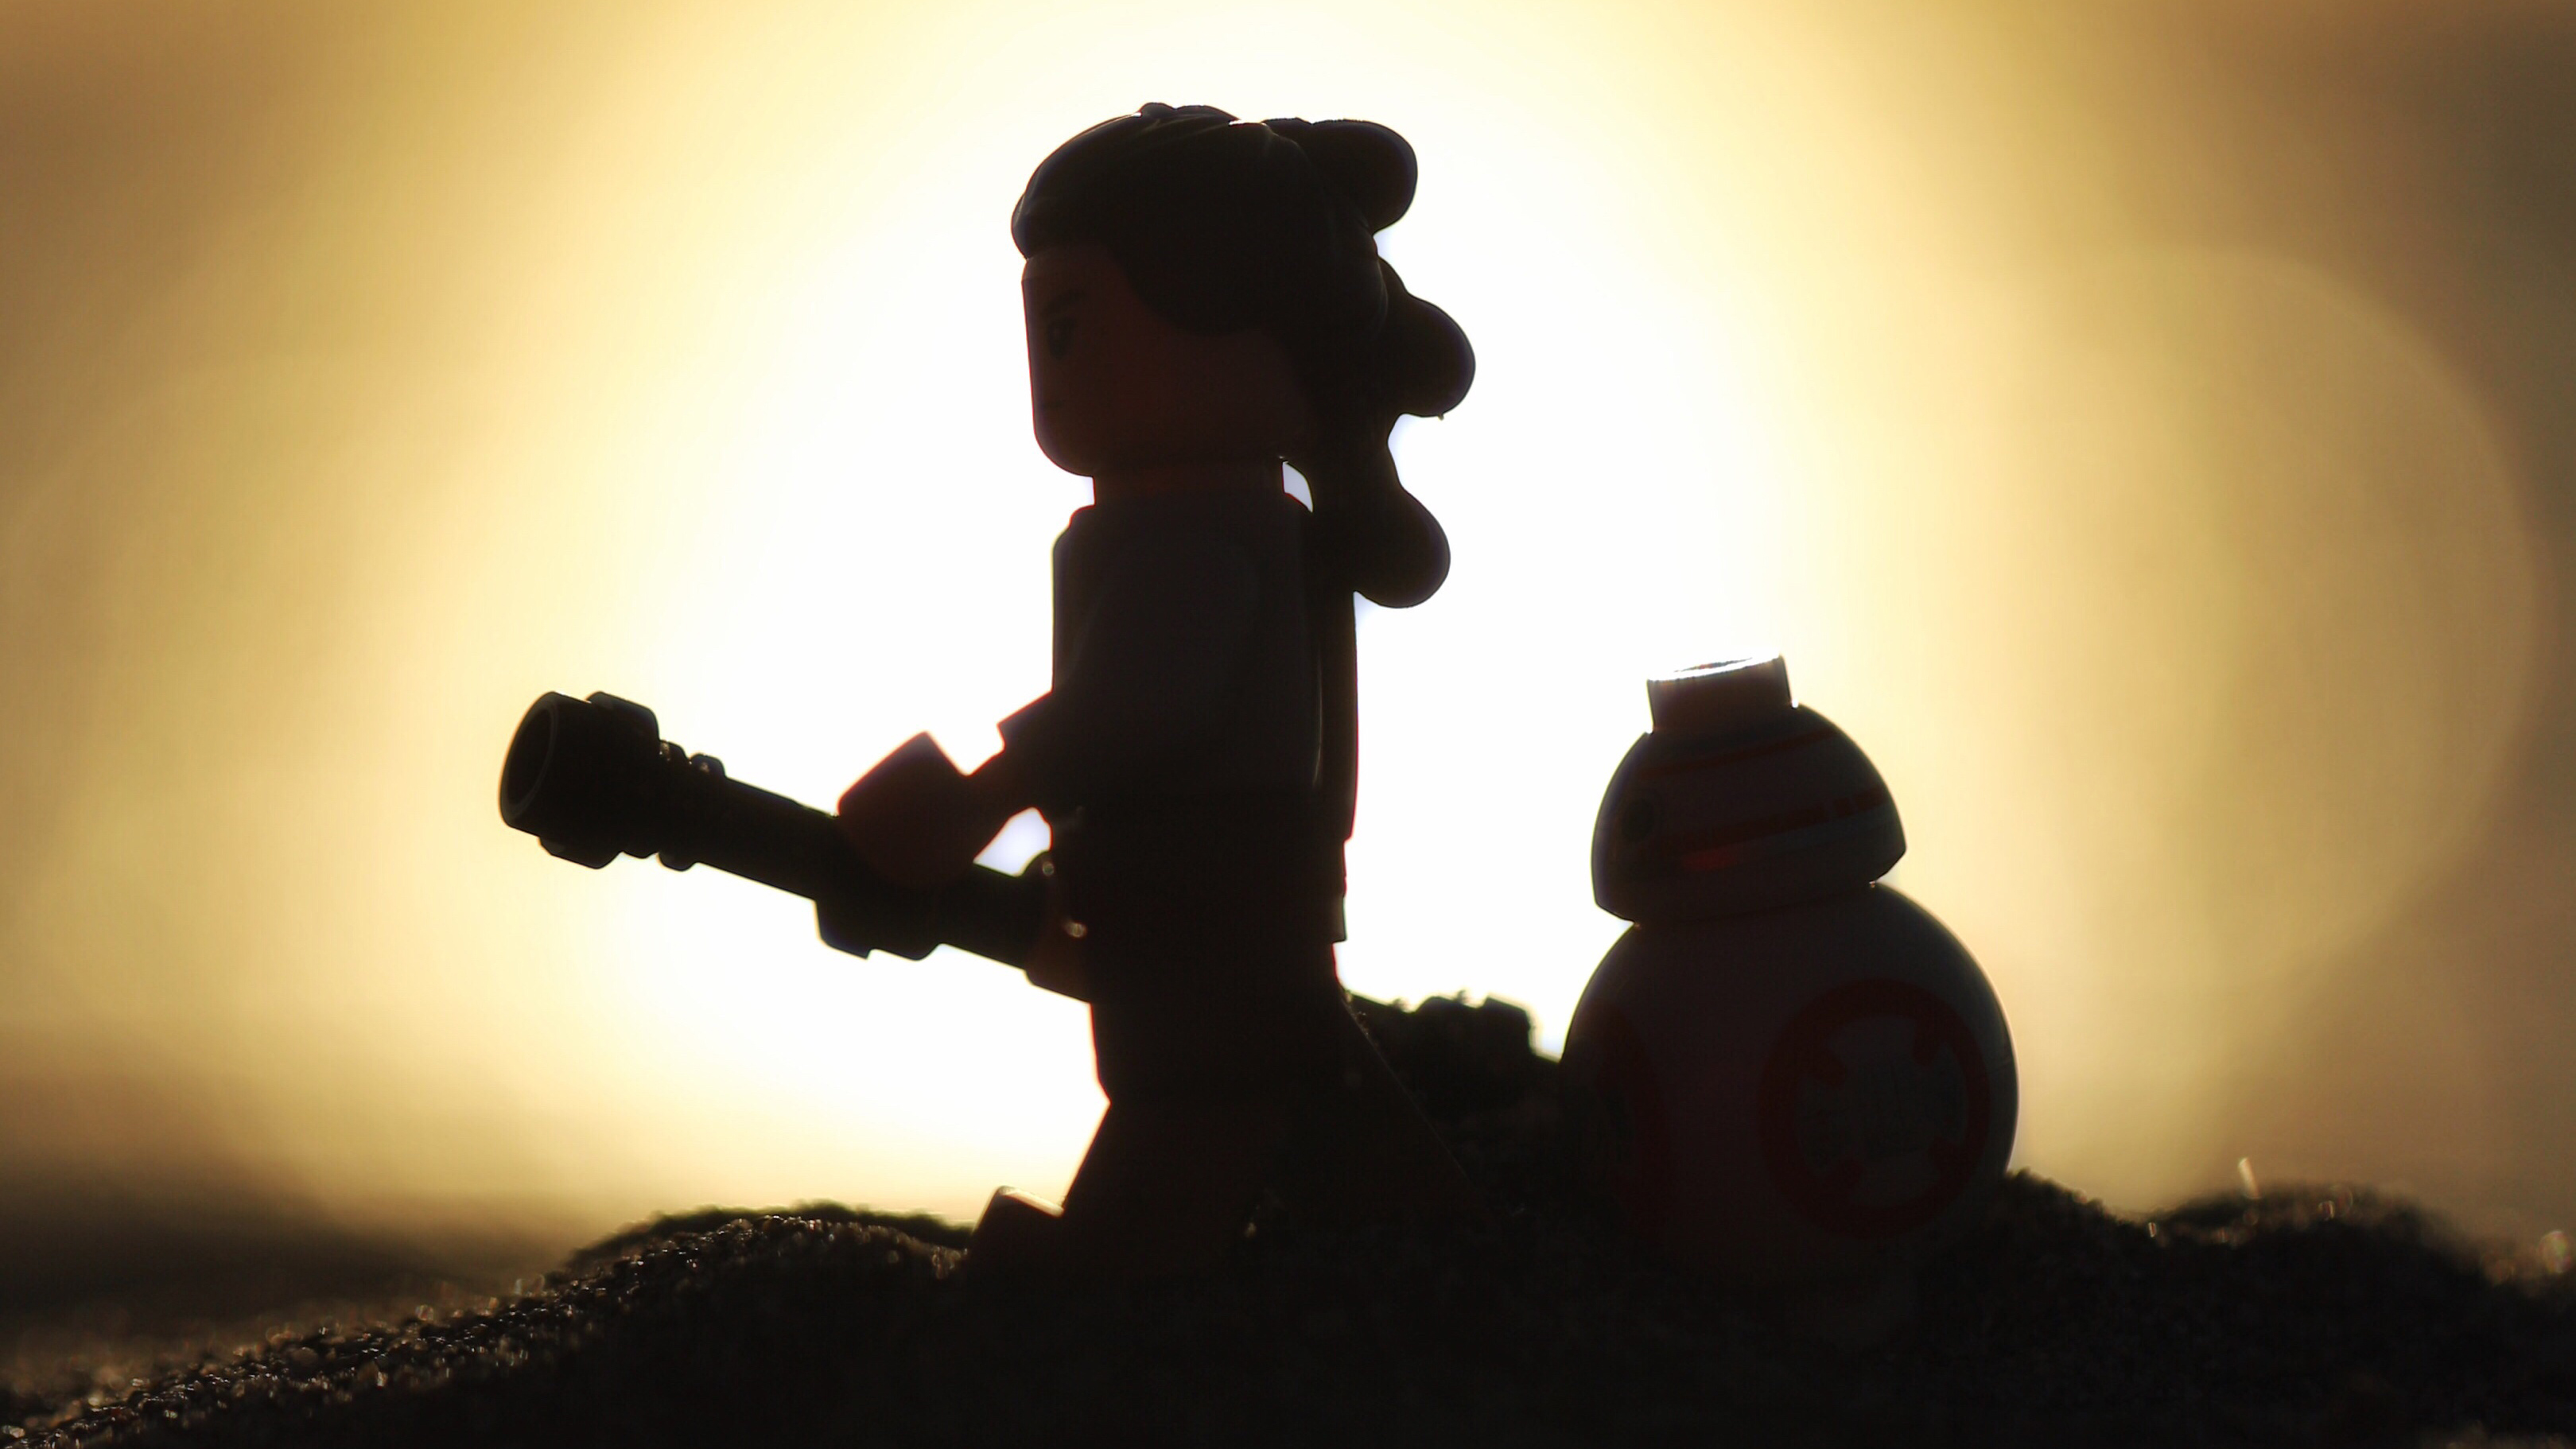 Rey-BB8-Sunset-Legography-xxsjc